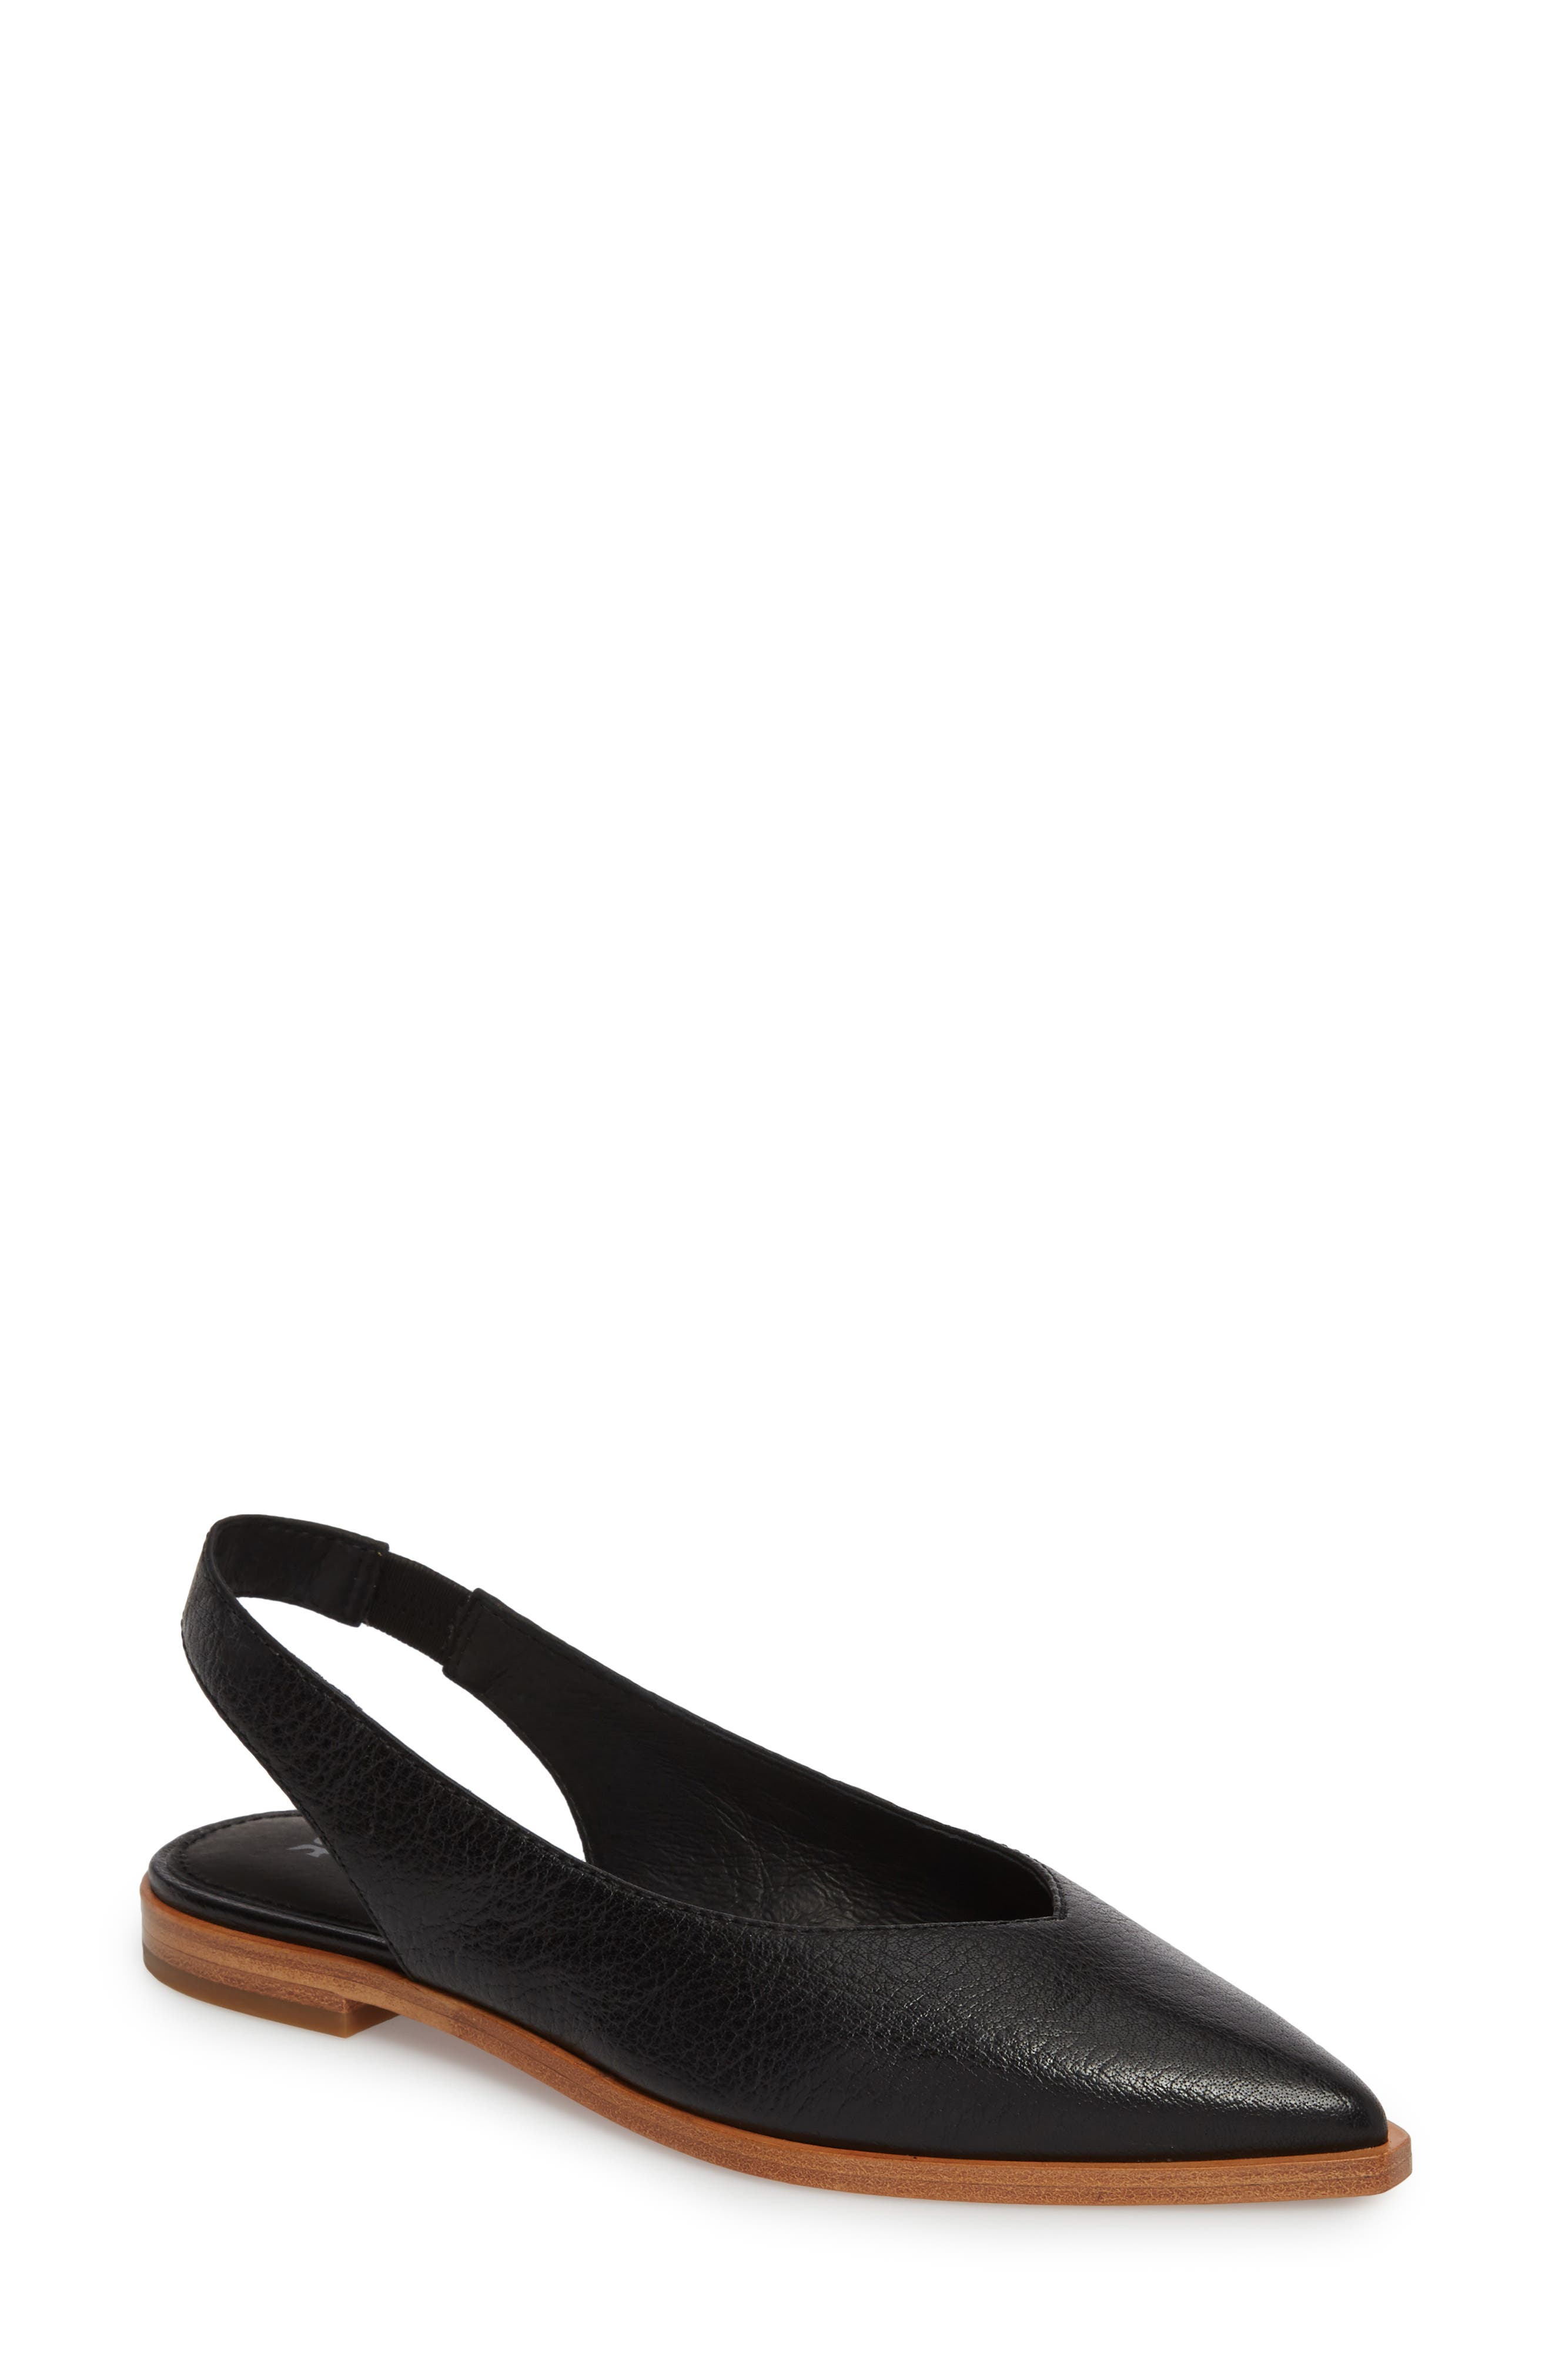 Kenzie Slingback Flat,                         Main,                         color, Black Leather